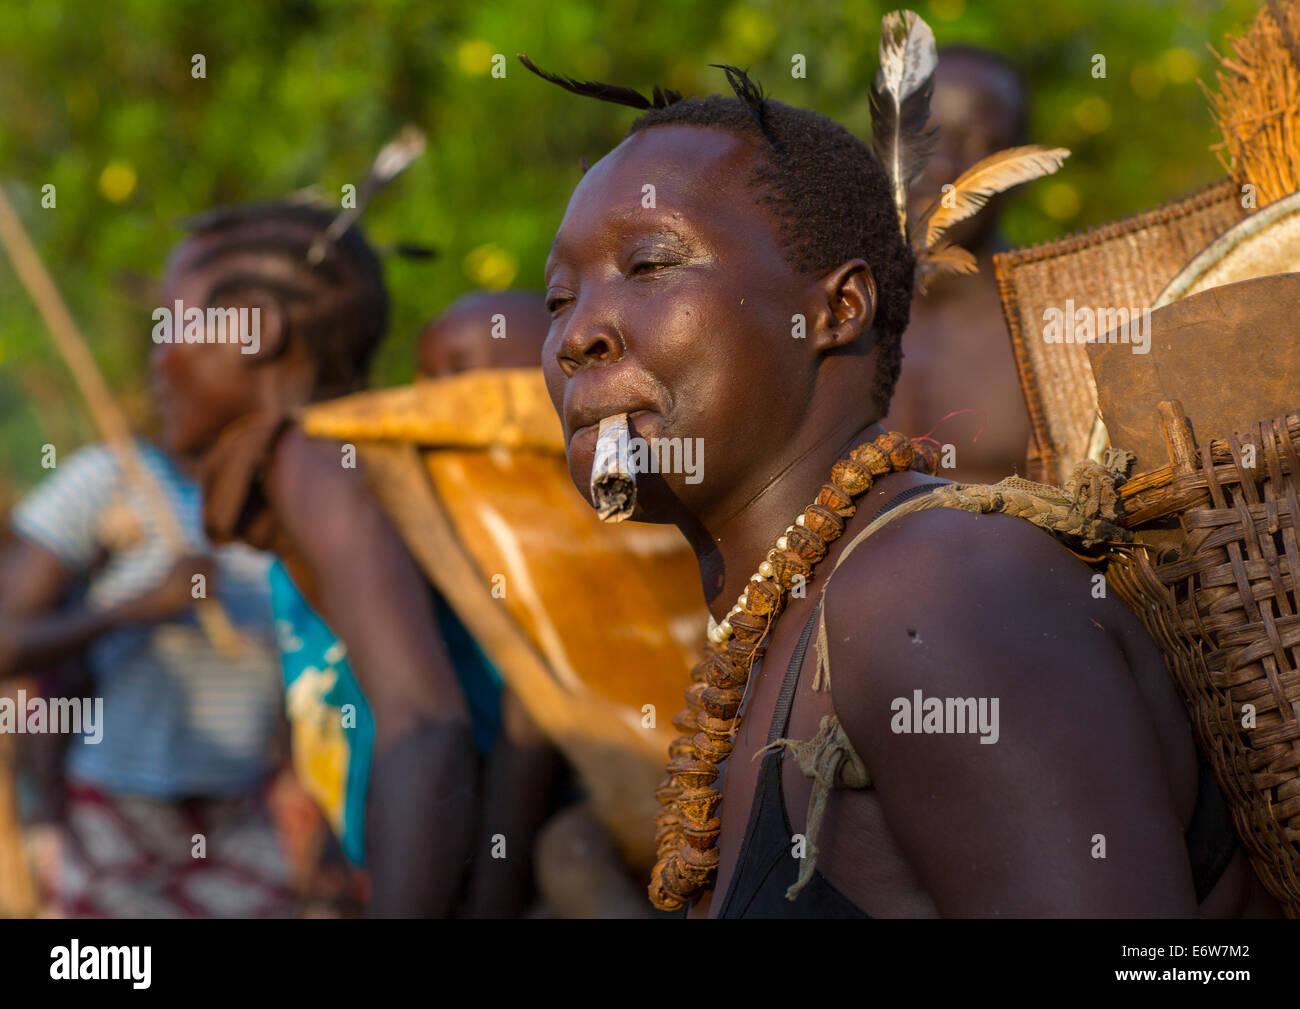 Majang Tribe Smoking For A Celebration, Kobown, Ethiopia - Stock Image